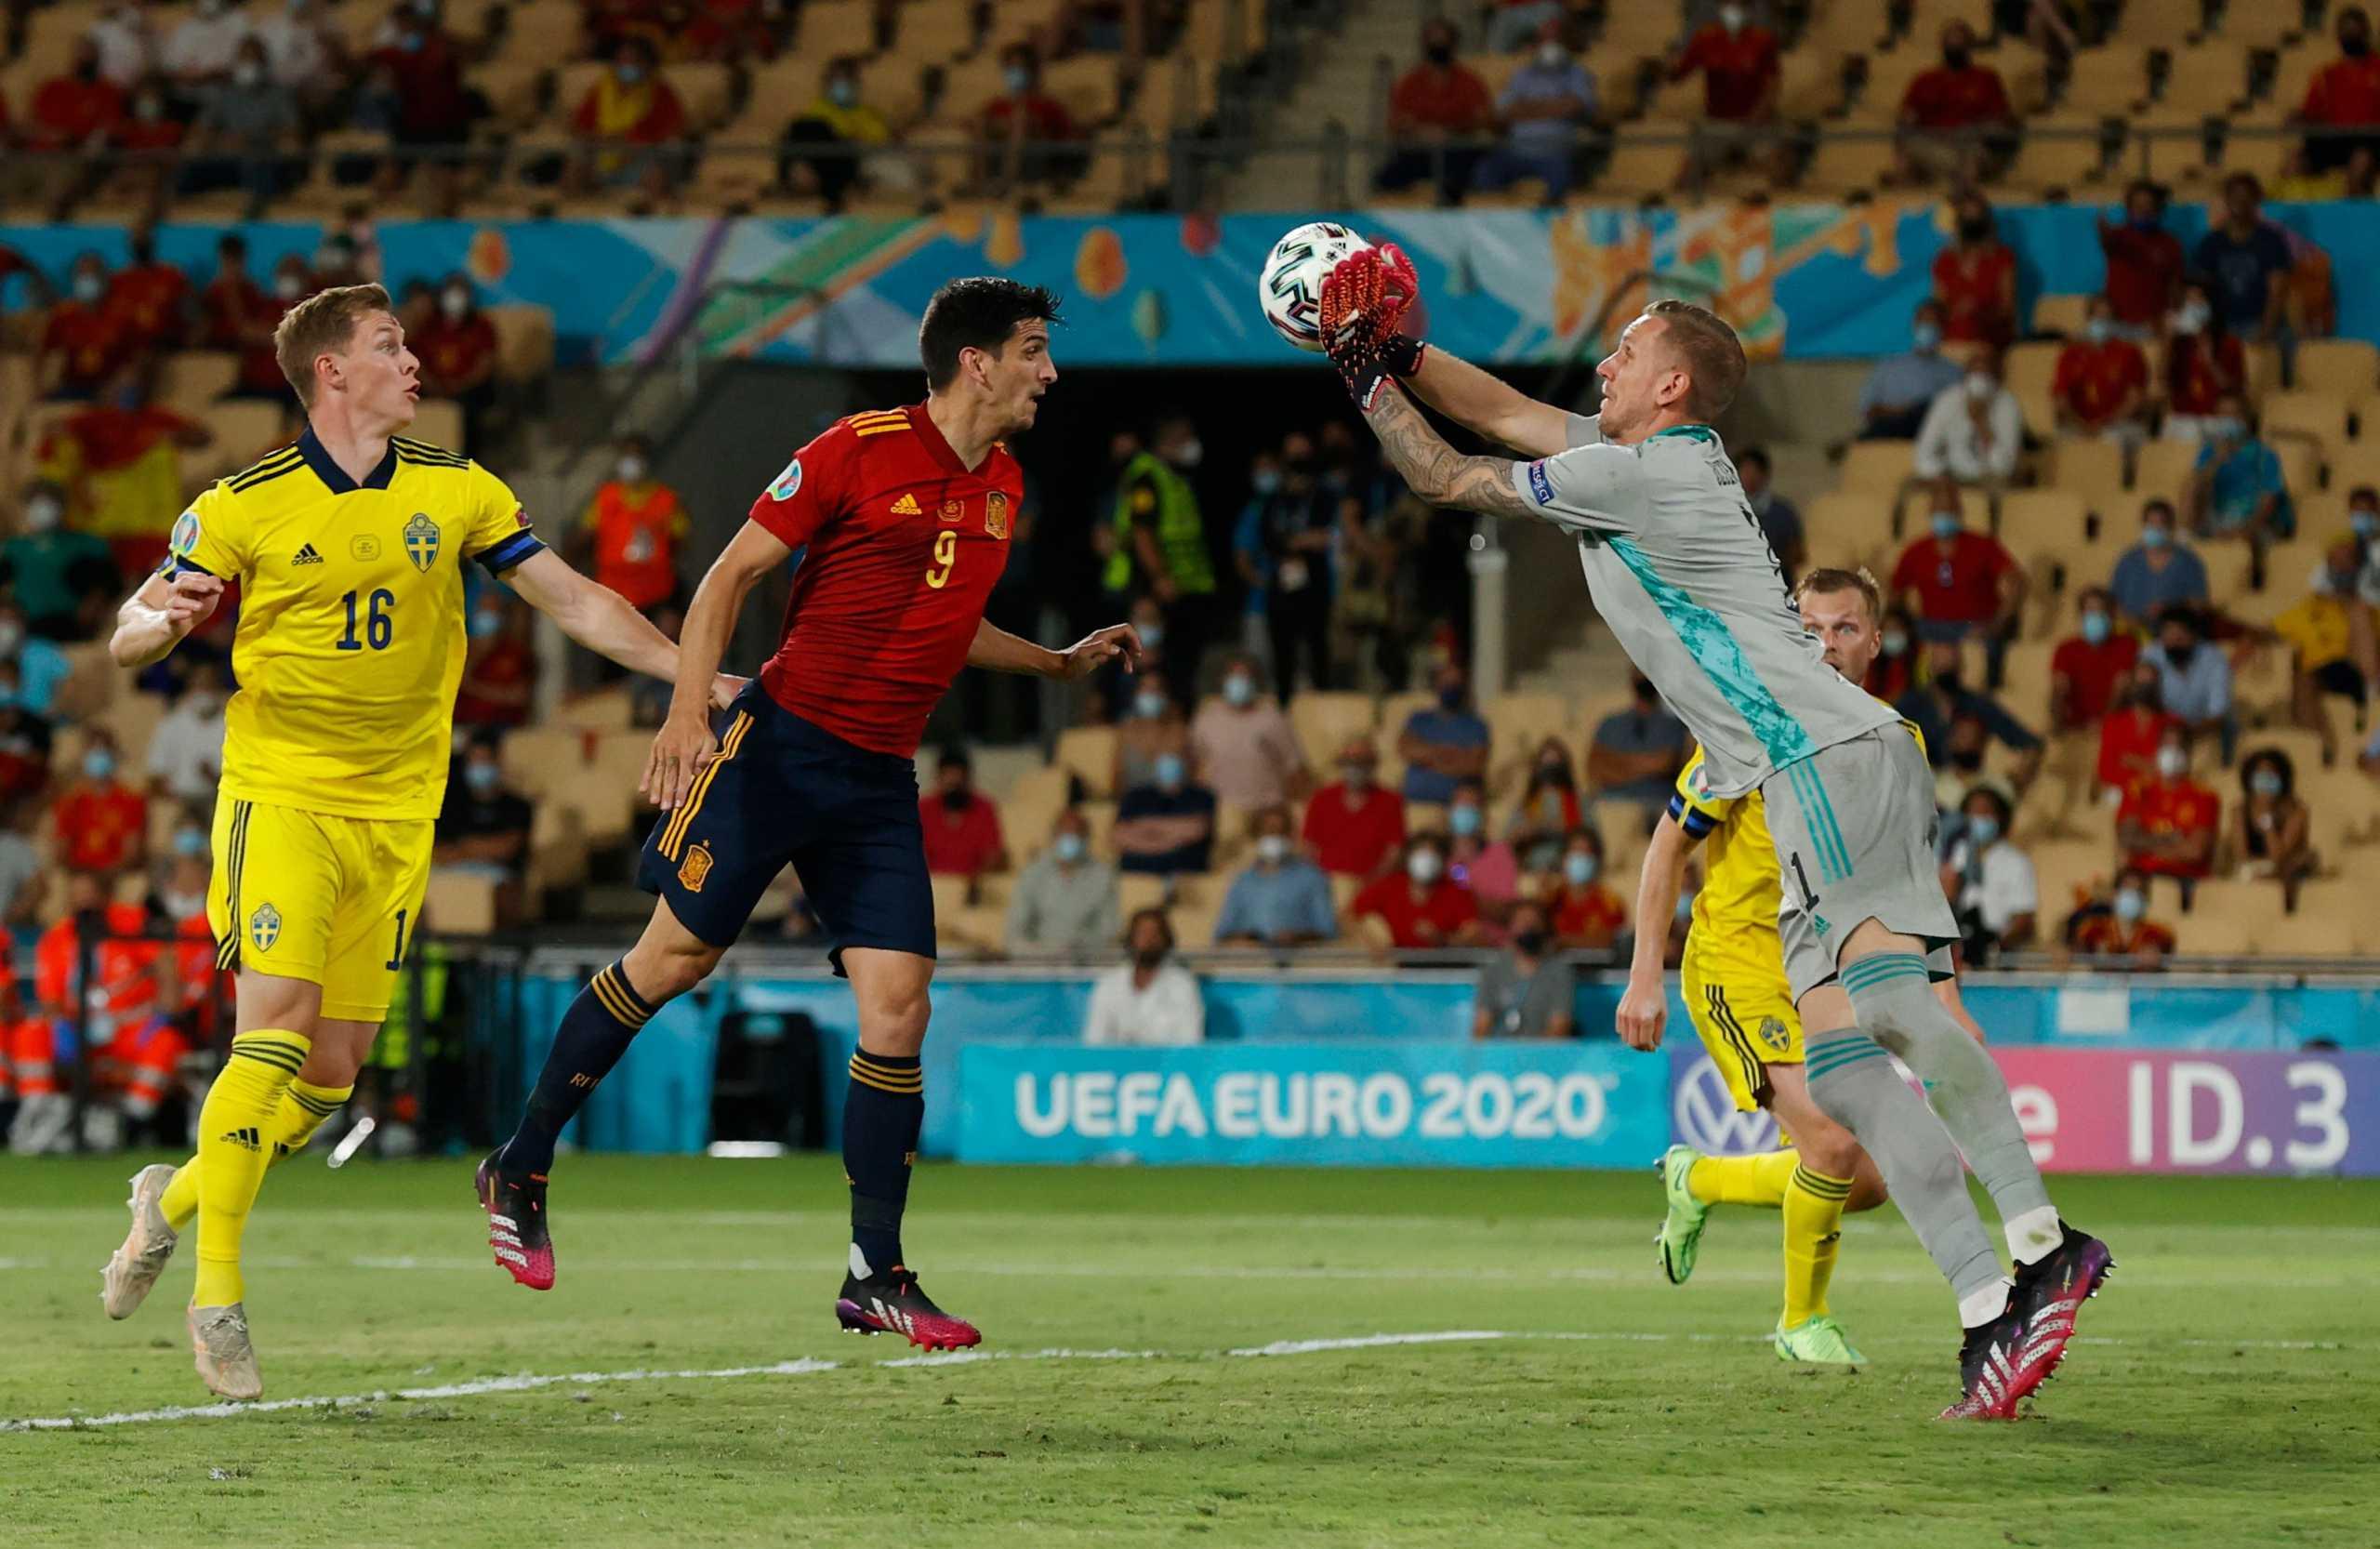 Euro 2020, Ισπανία – Σουηδία: Ο Όλσεν ύψωσε «τείχος» στους Ίβηρες